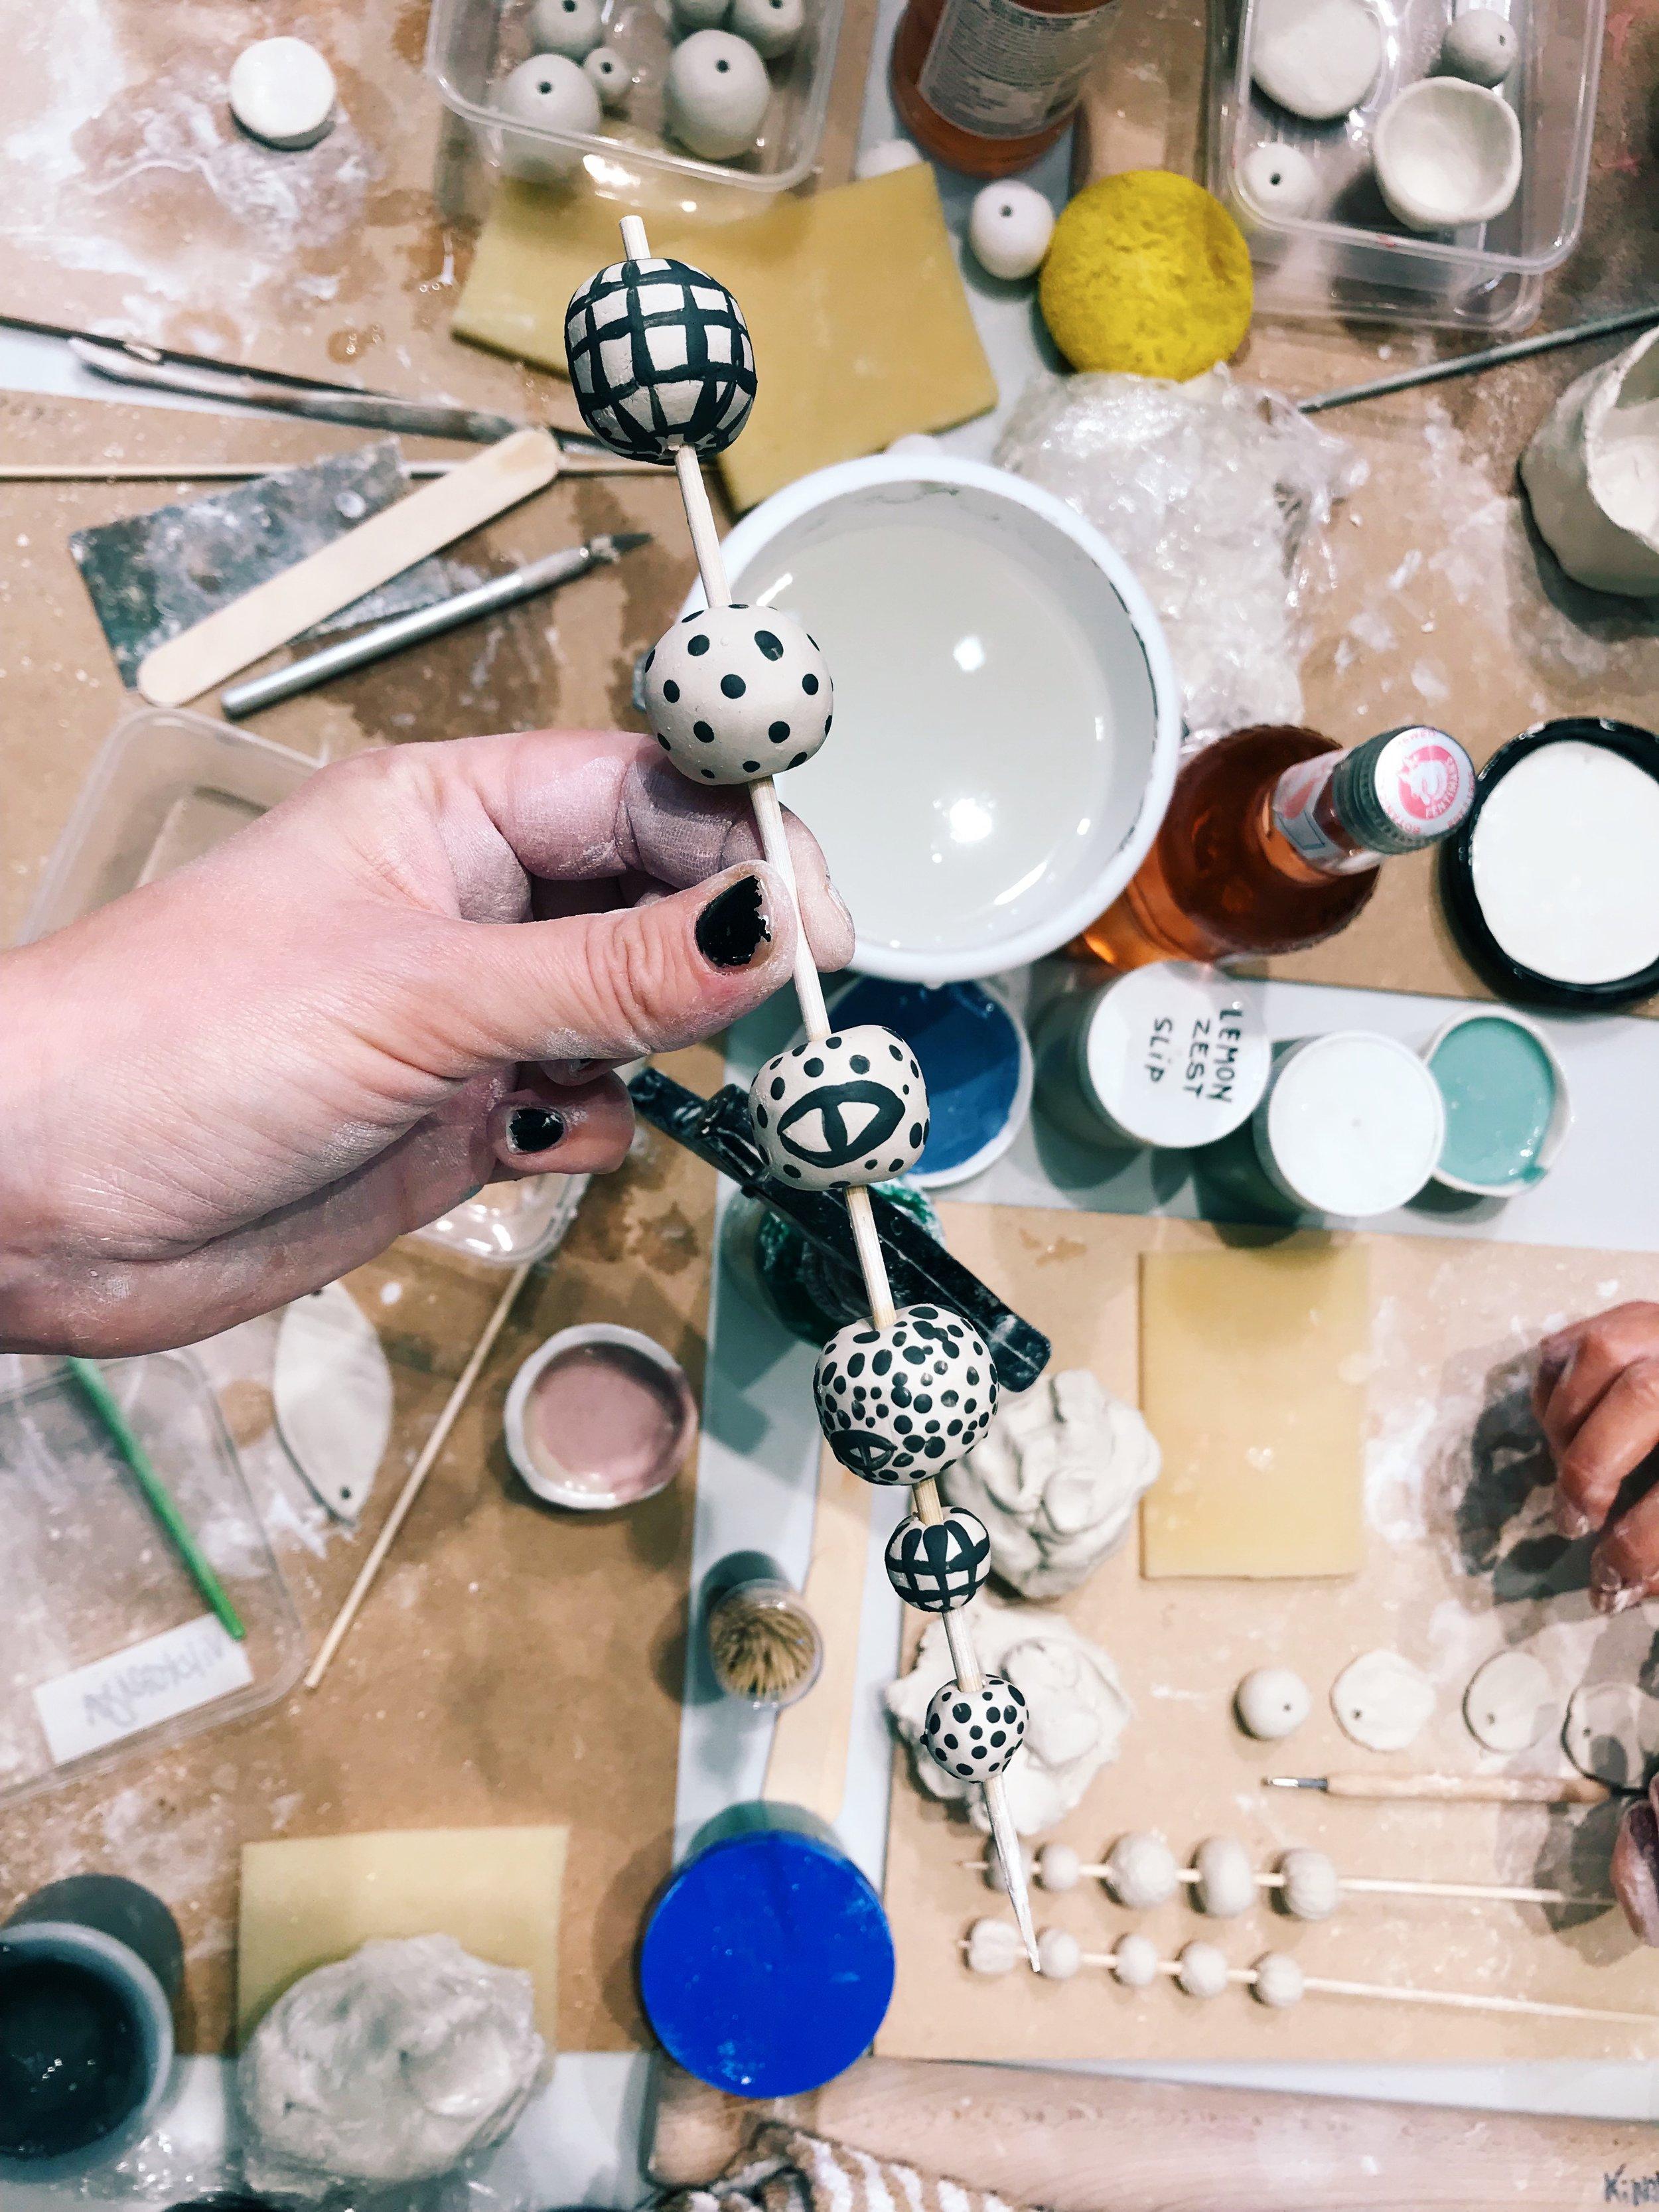 kinska workshop ceramics